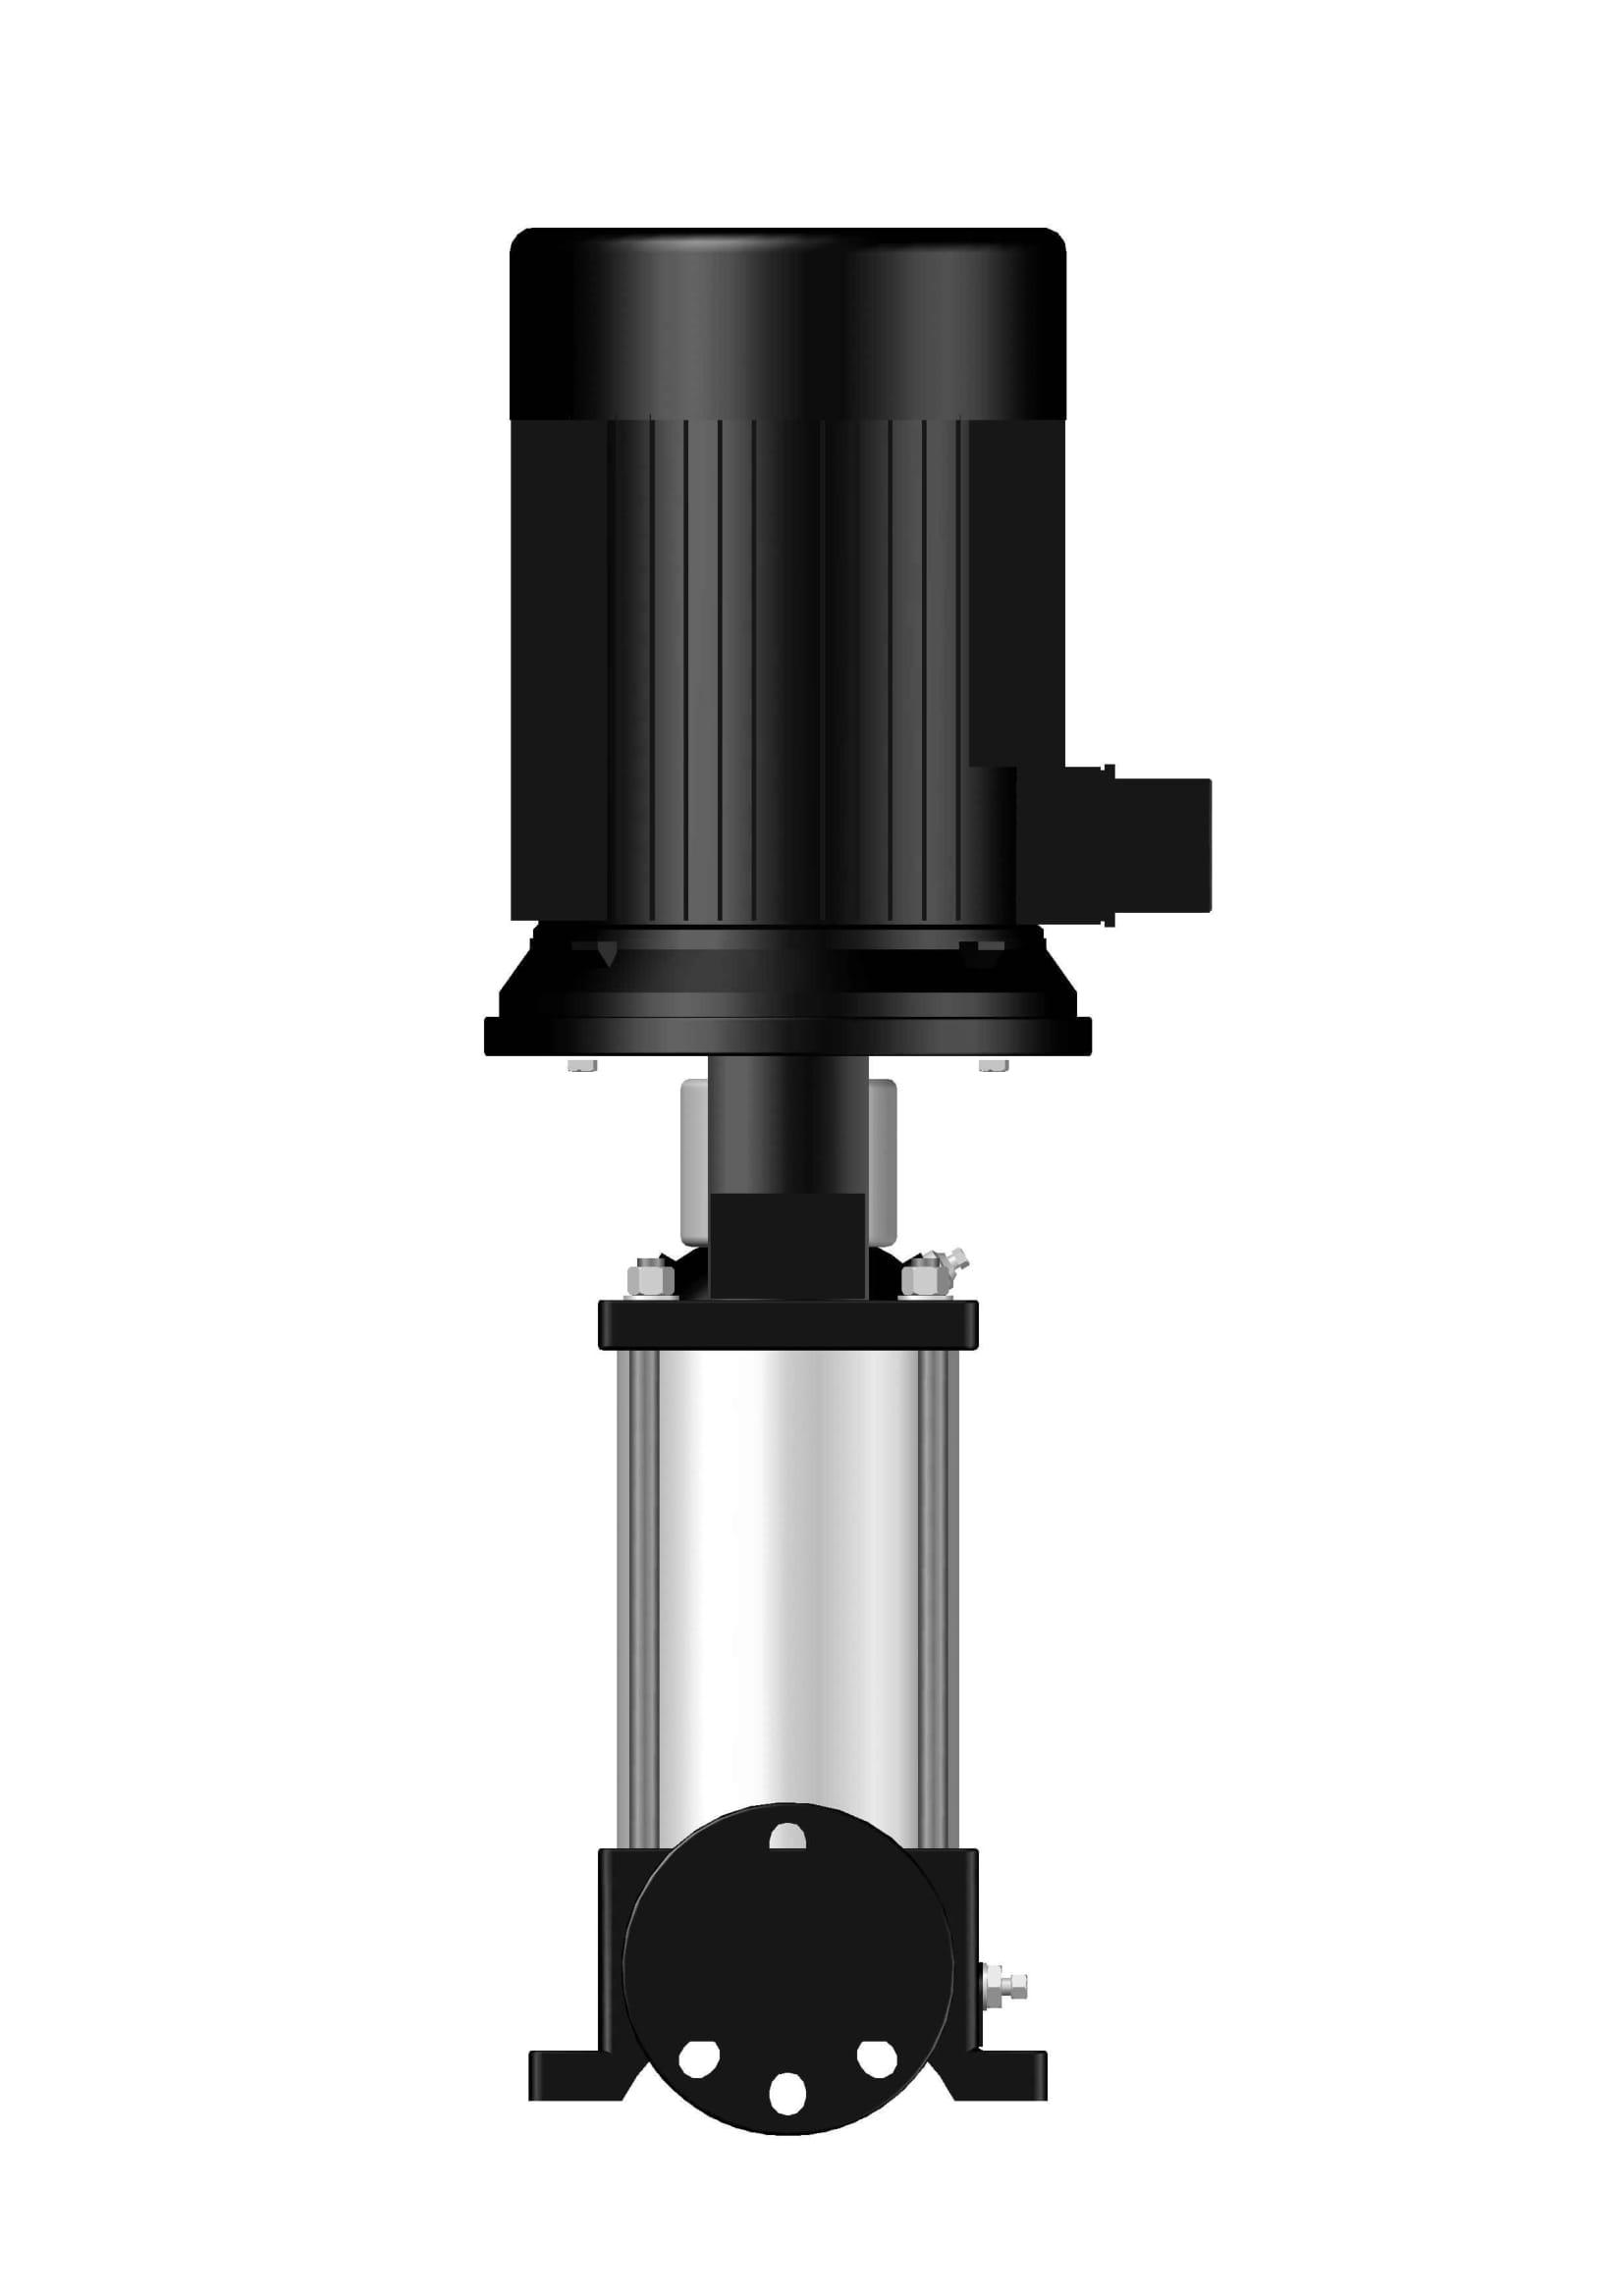 BV20-05